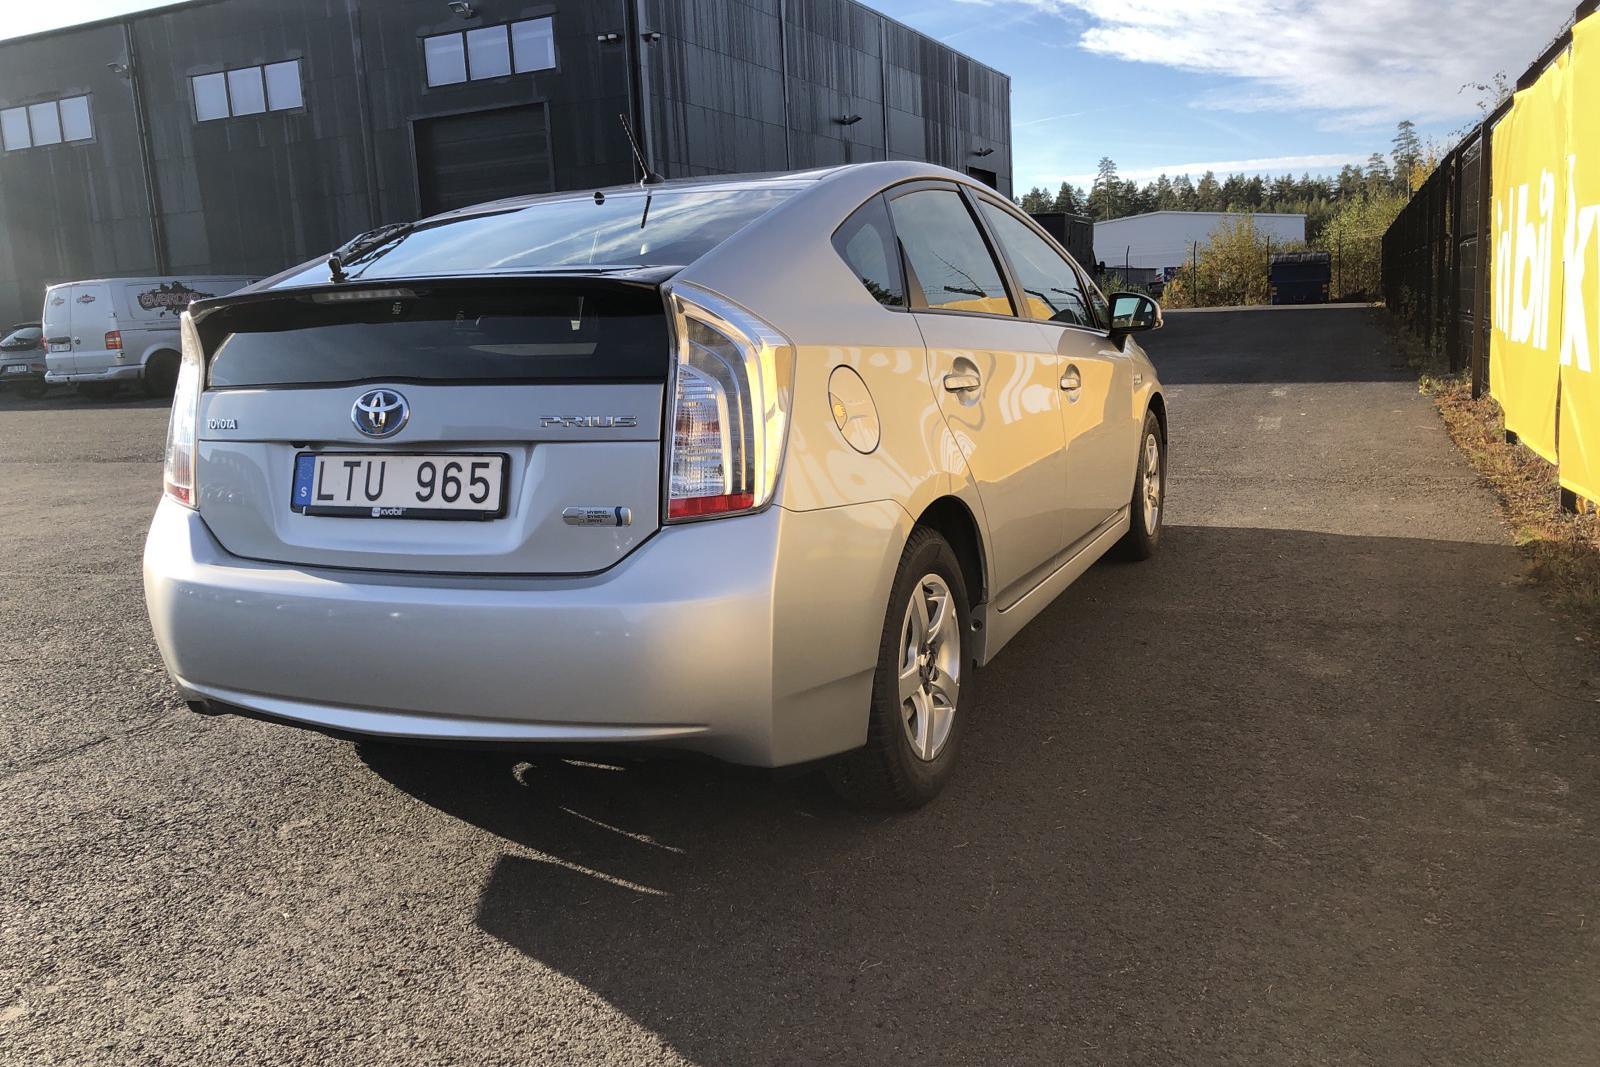 Toyota Prius 1.8 Plug-in Hybrid (99hk) - 38 170 km - Automatic - silver - 2012